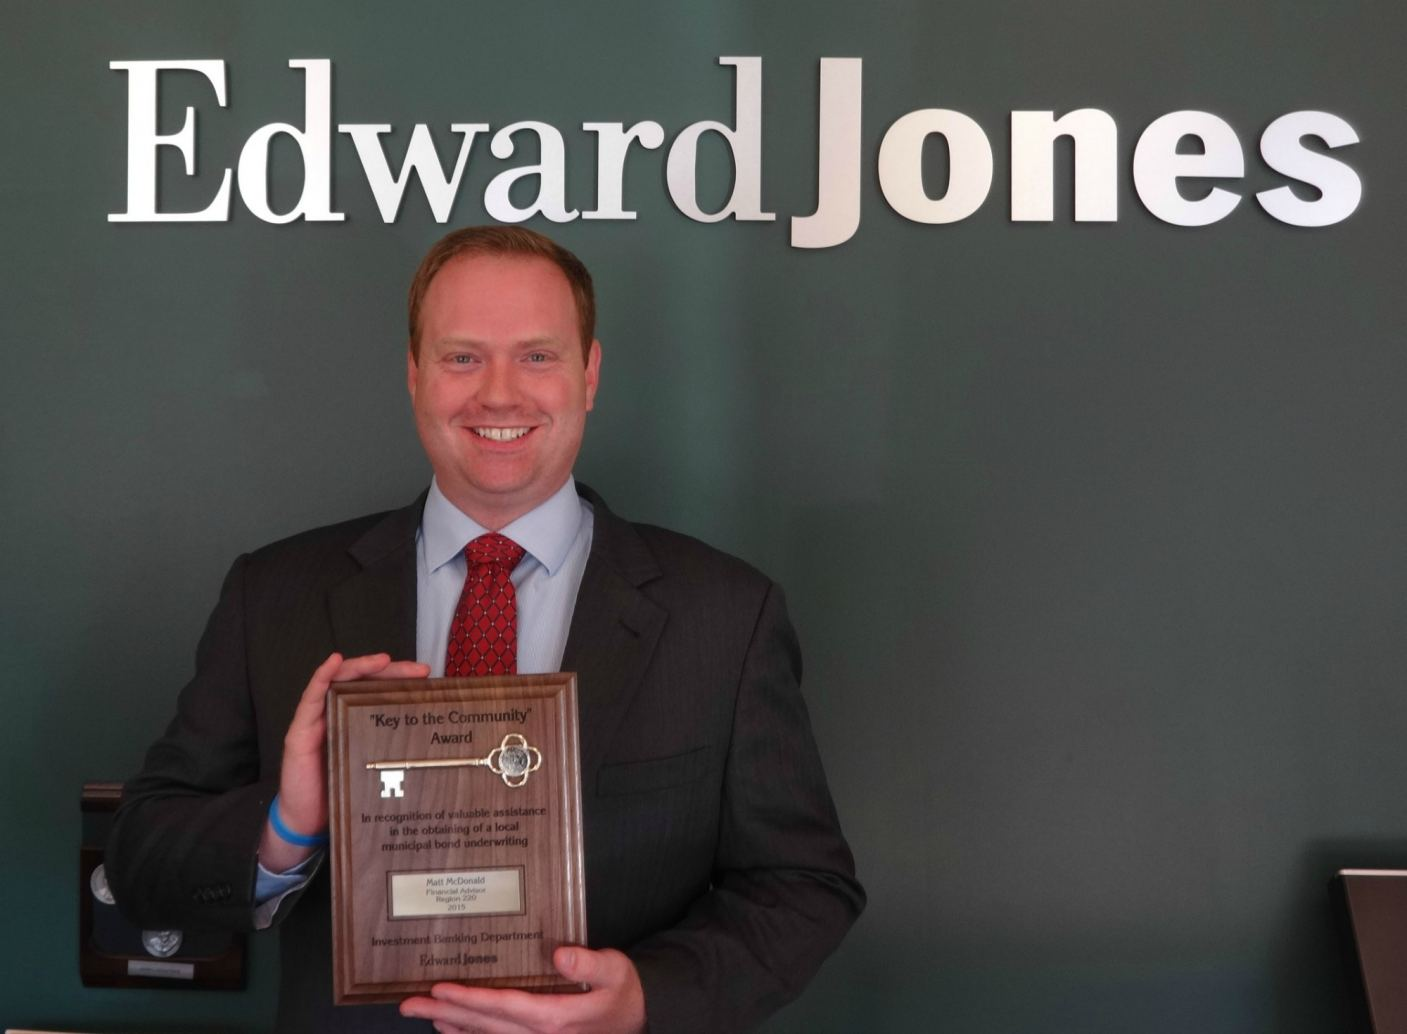 Edward Jones Key to the Community award - Matt McDonald in Kalamazoo